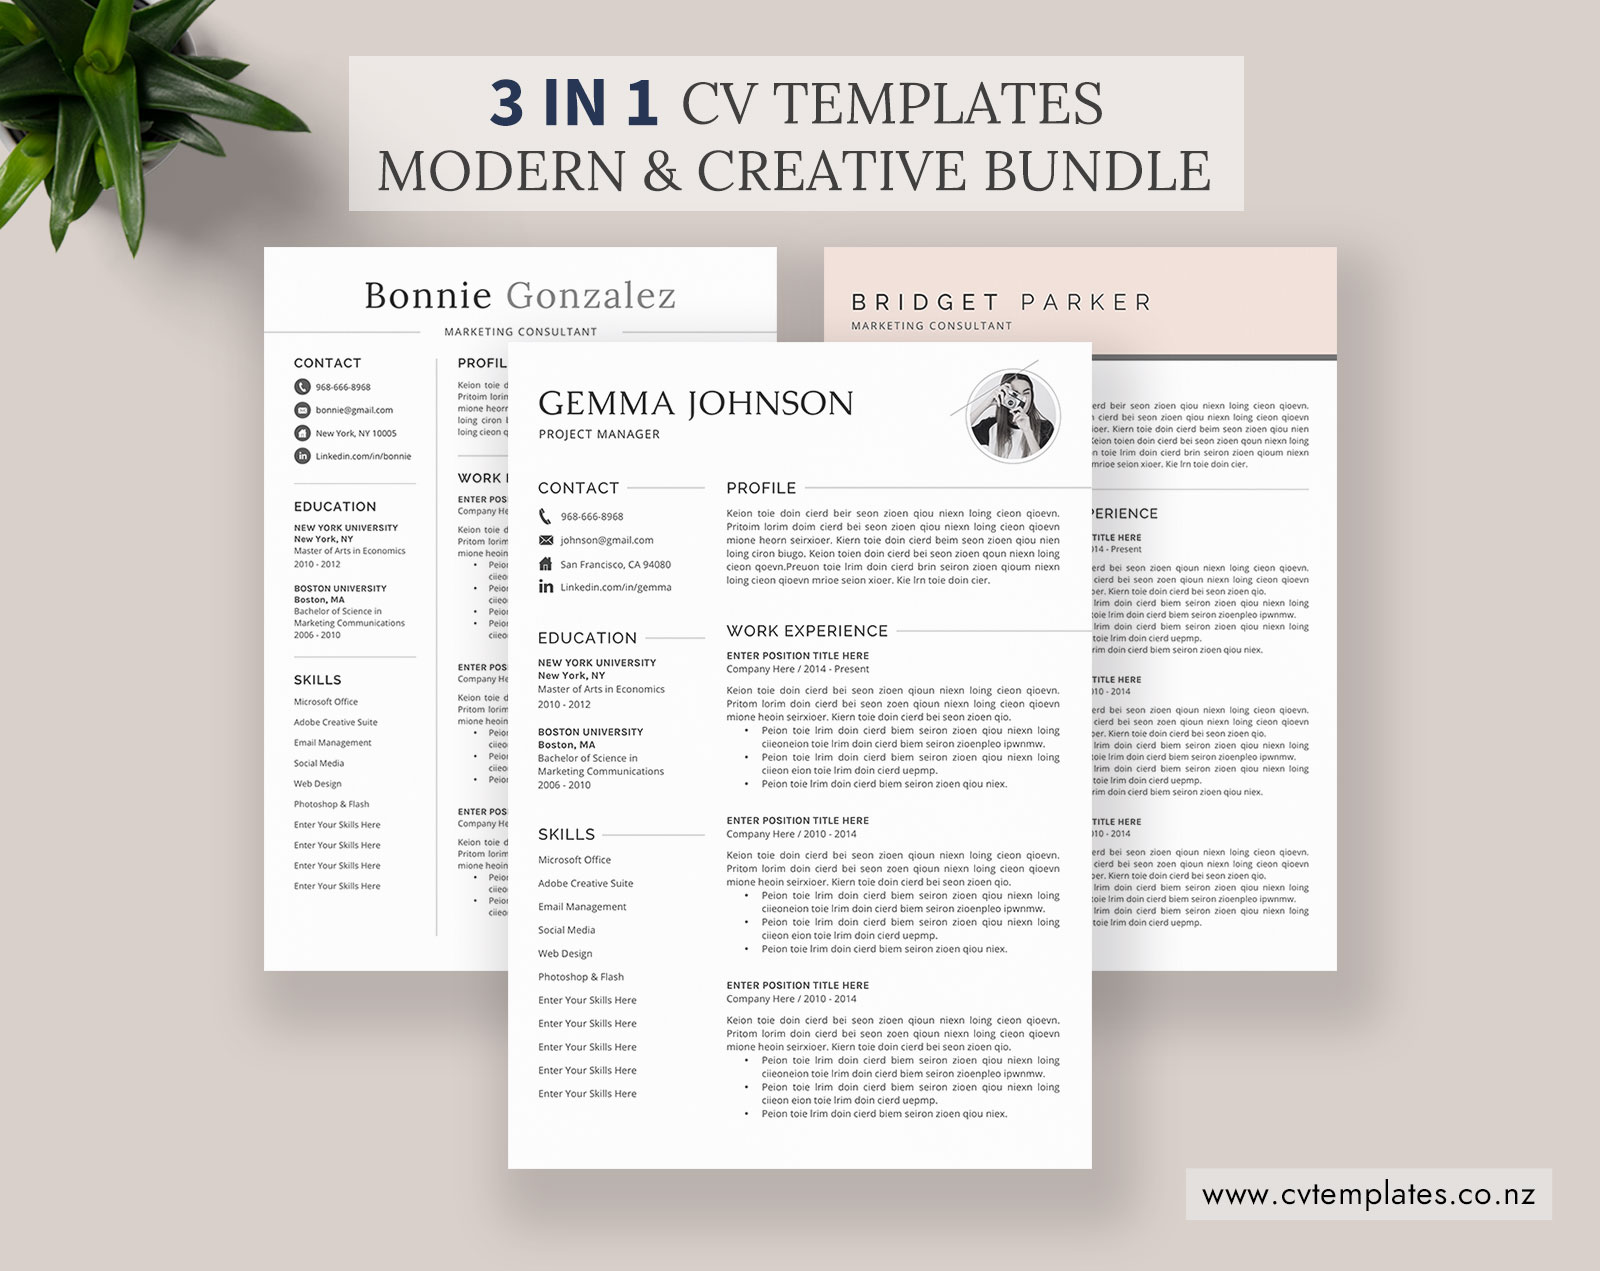 CV Bundle, CV Templates, Professional Curriculum Vitae, MS Word CV  Template, Minimalist CV Format, Cover Letter, Modern & Creative Resume,  Instant ...